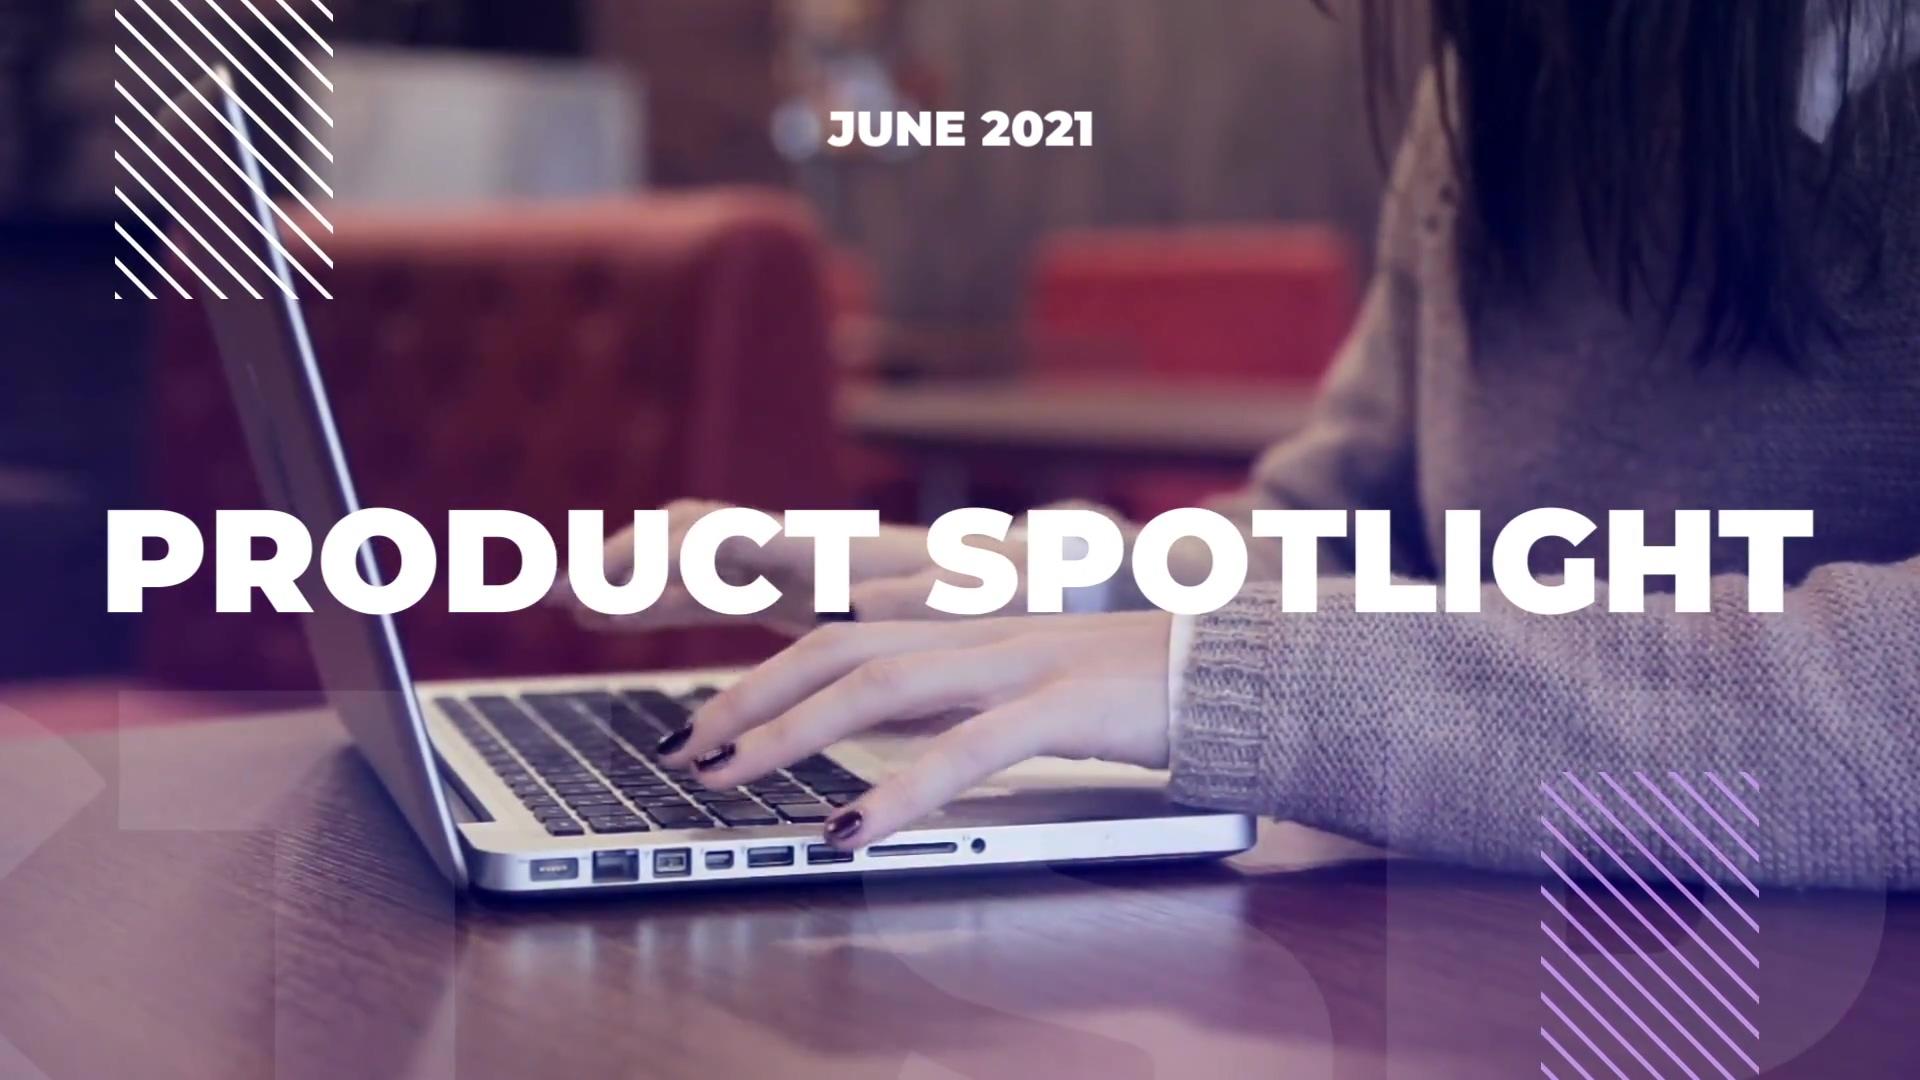 Product Spotlight_June 2021